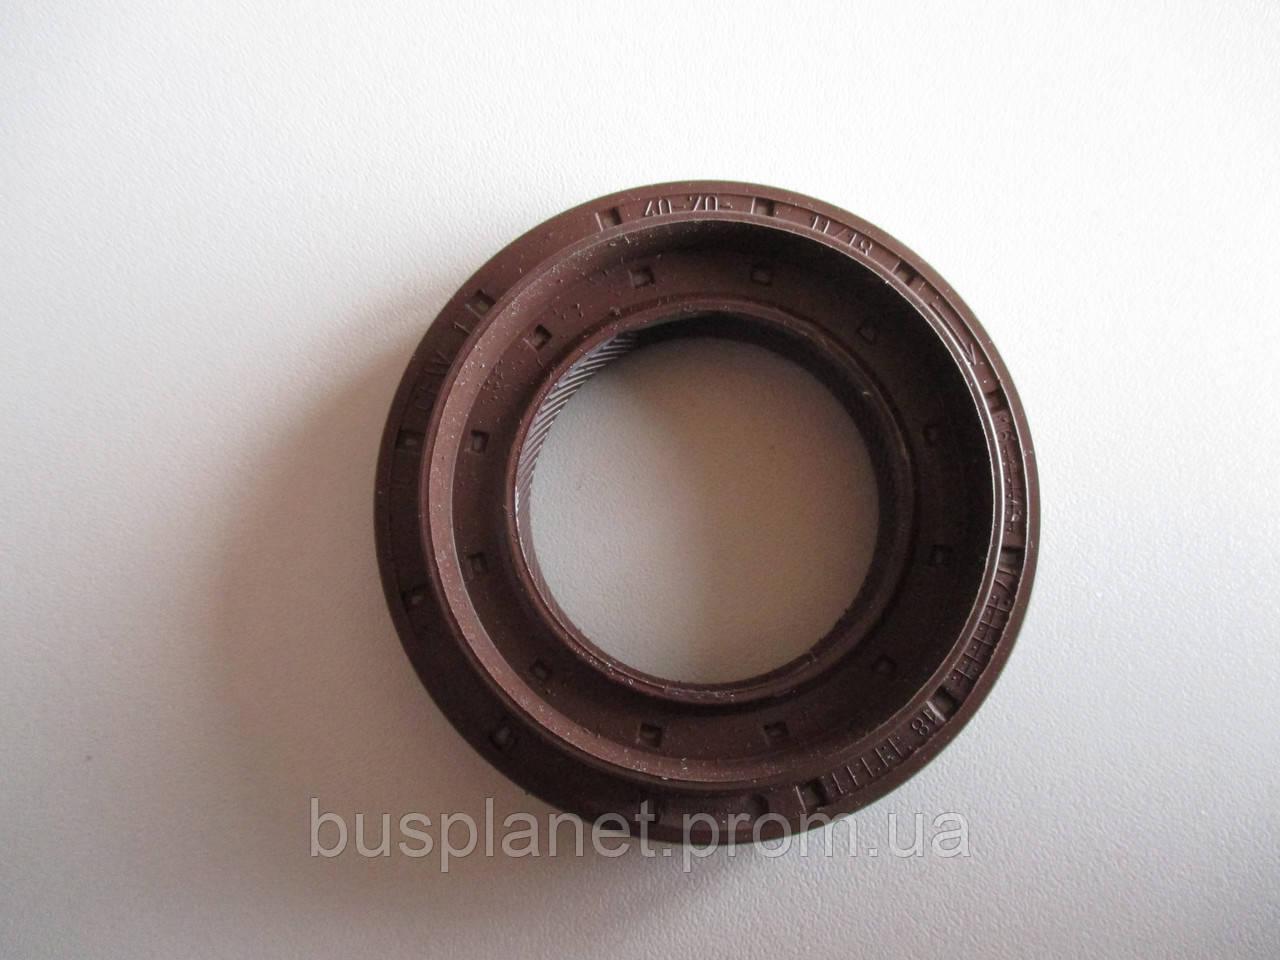 Сальник хвостовика (Уплотняющее кольцо, дифференциала (40x70x11/18)